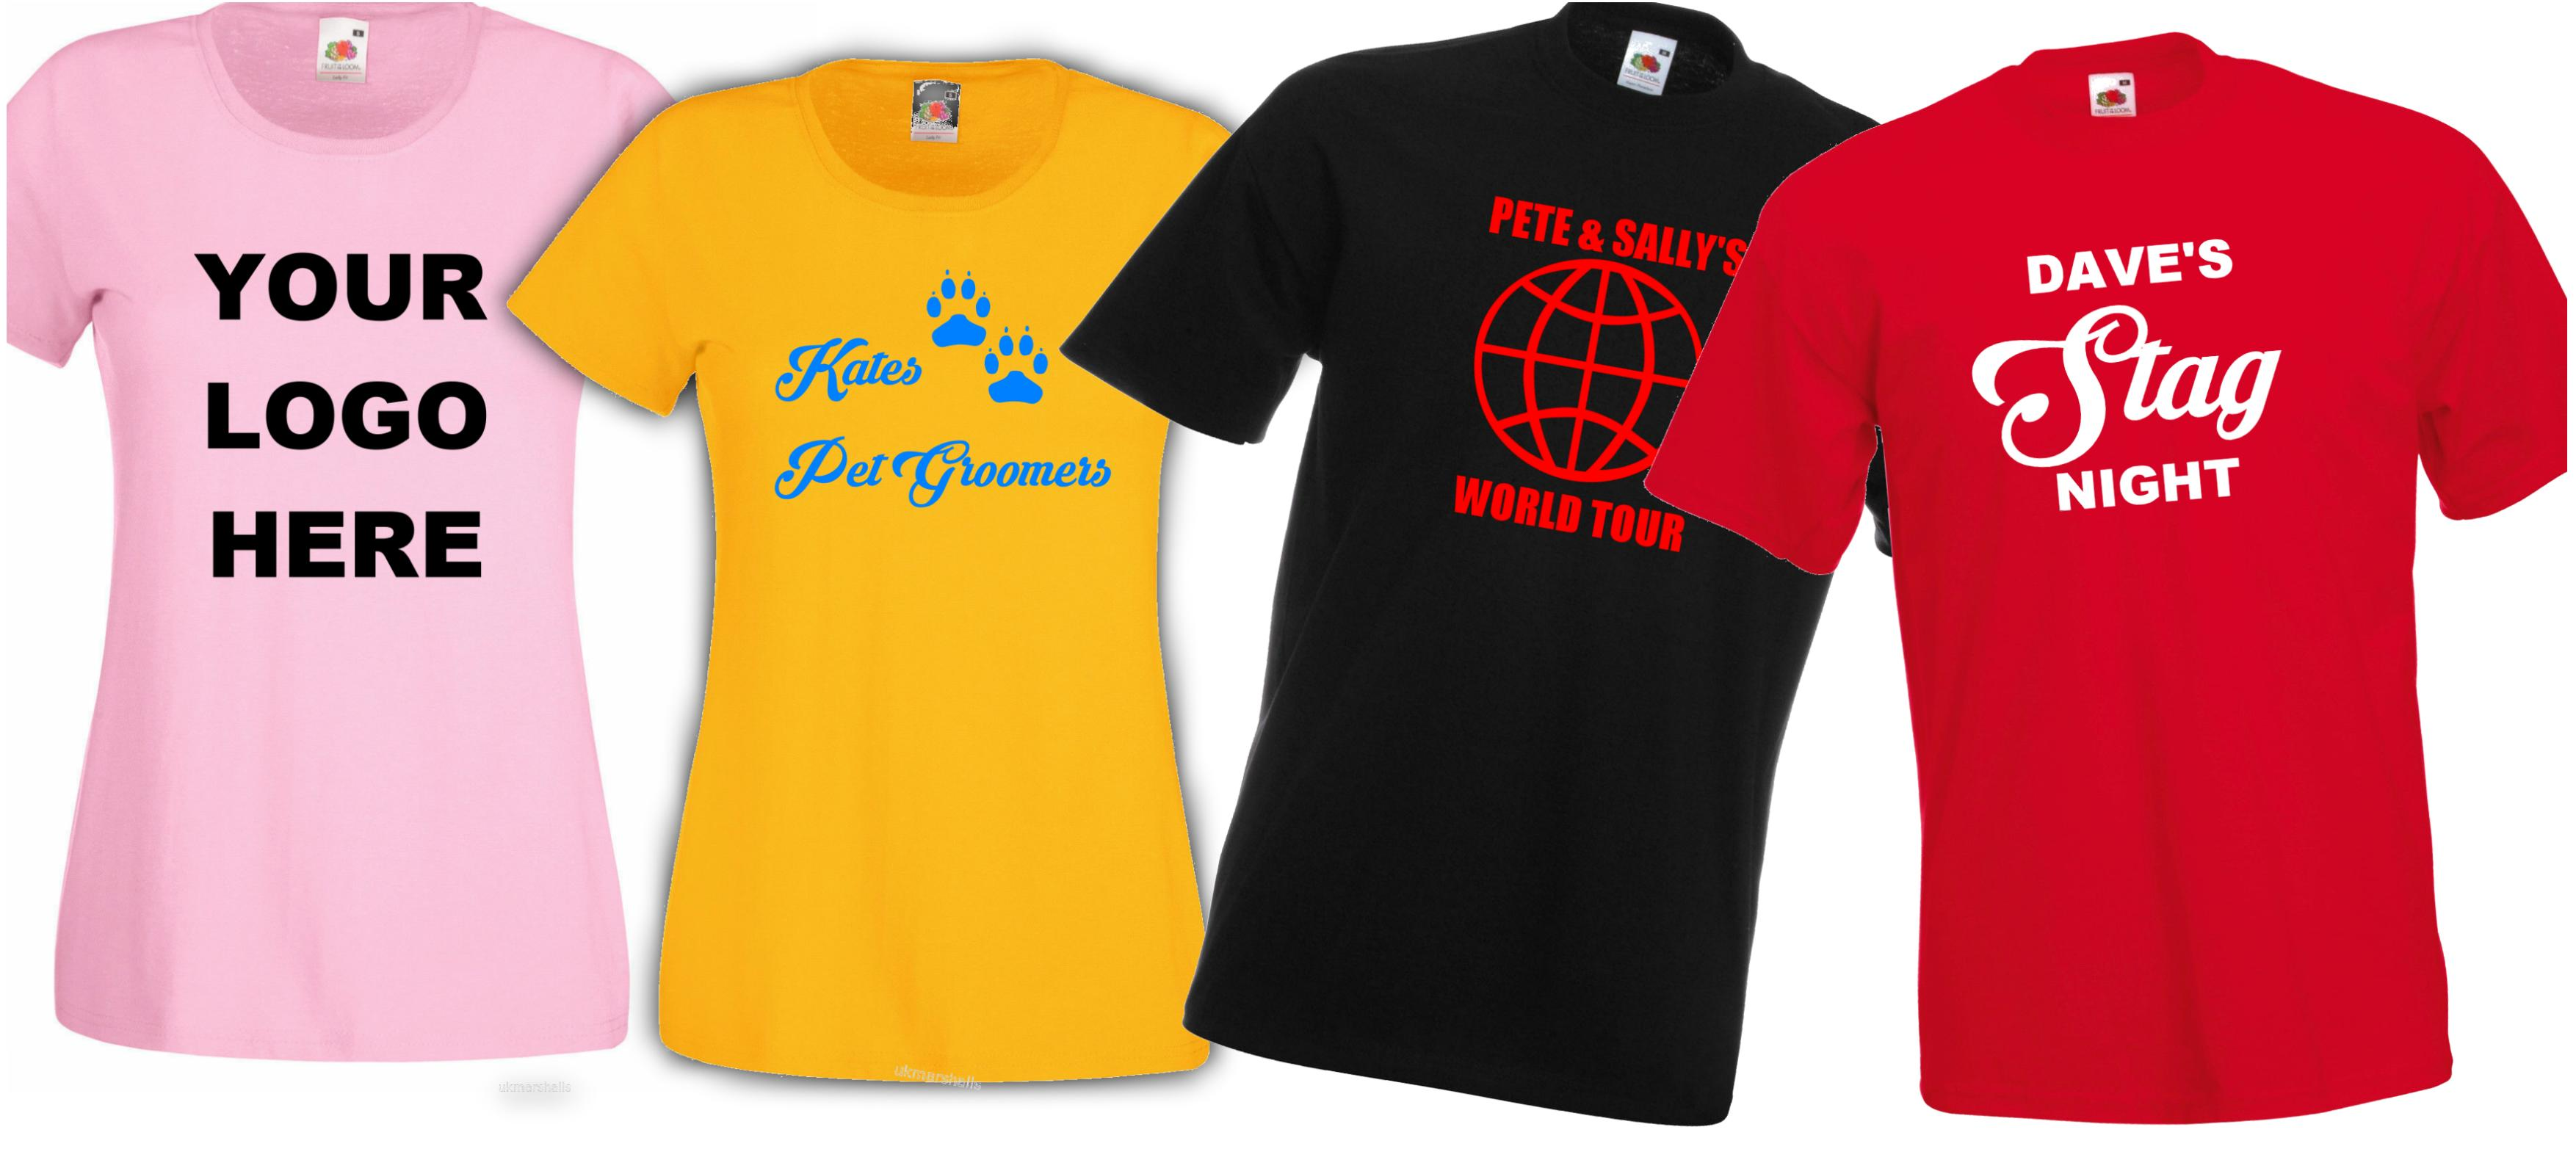 Cheap Custom Printed T Shirts In Bulk